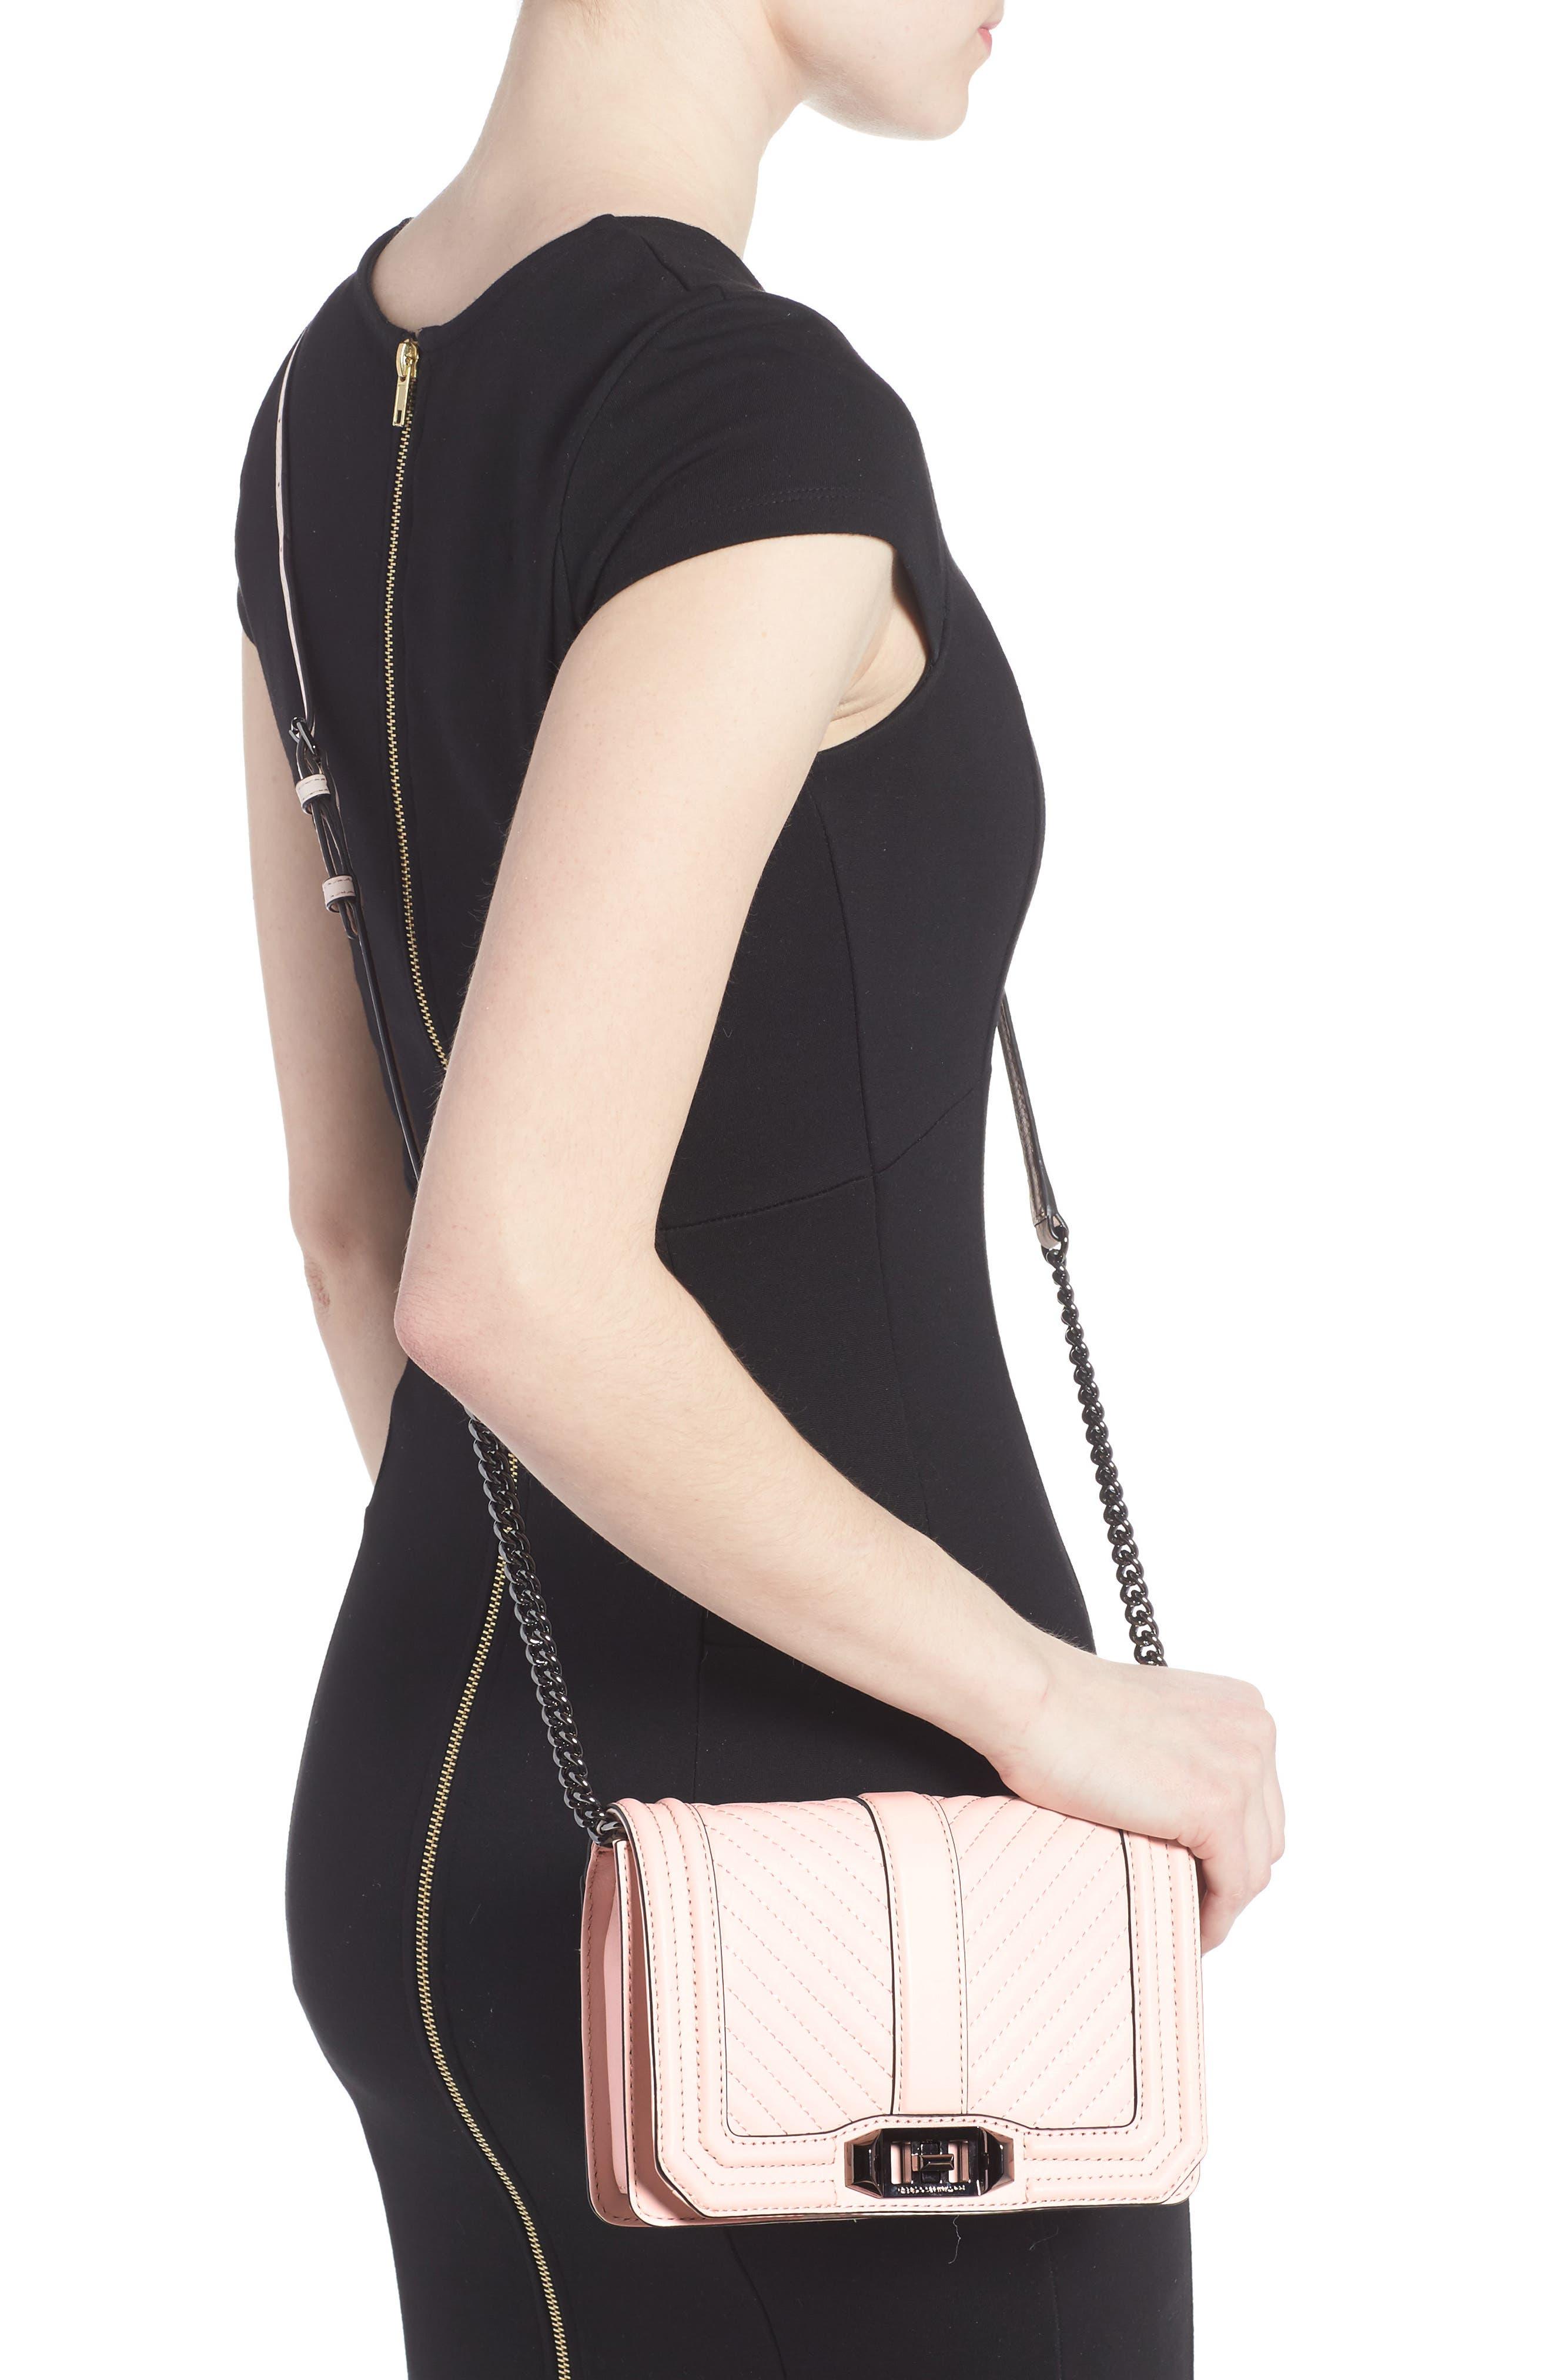 Small Love Leather Crossbody Bag,                             Alternate thumbnail 2, color,                             Soft Blush/ Gunmetal